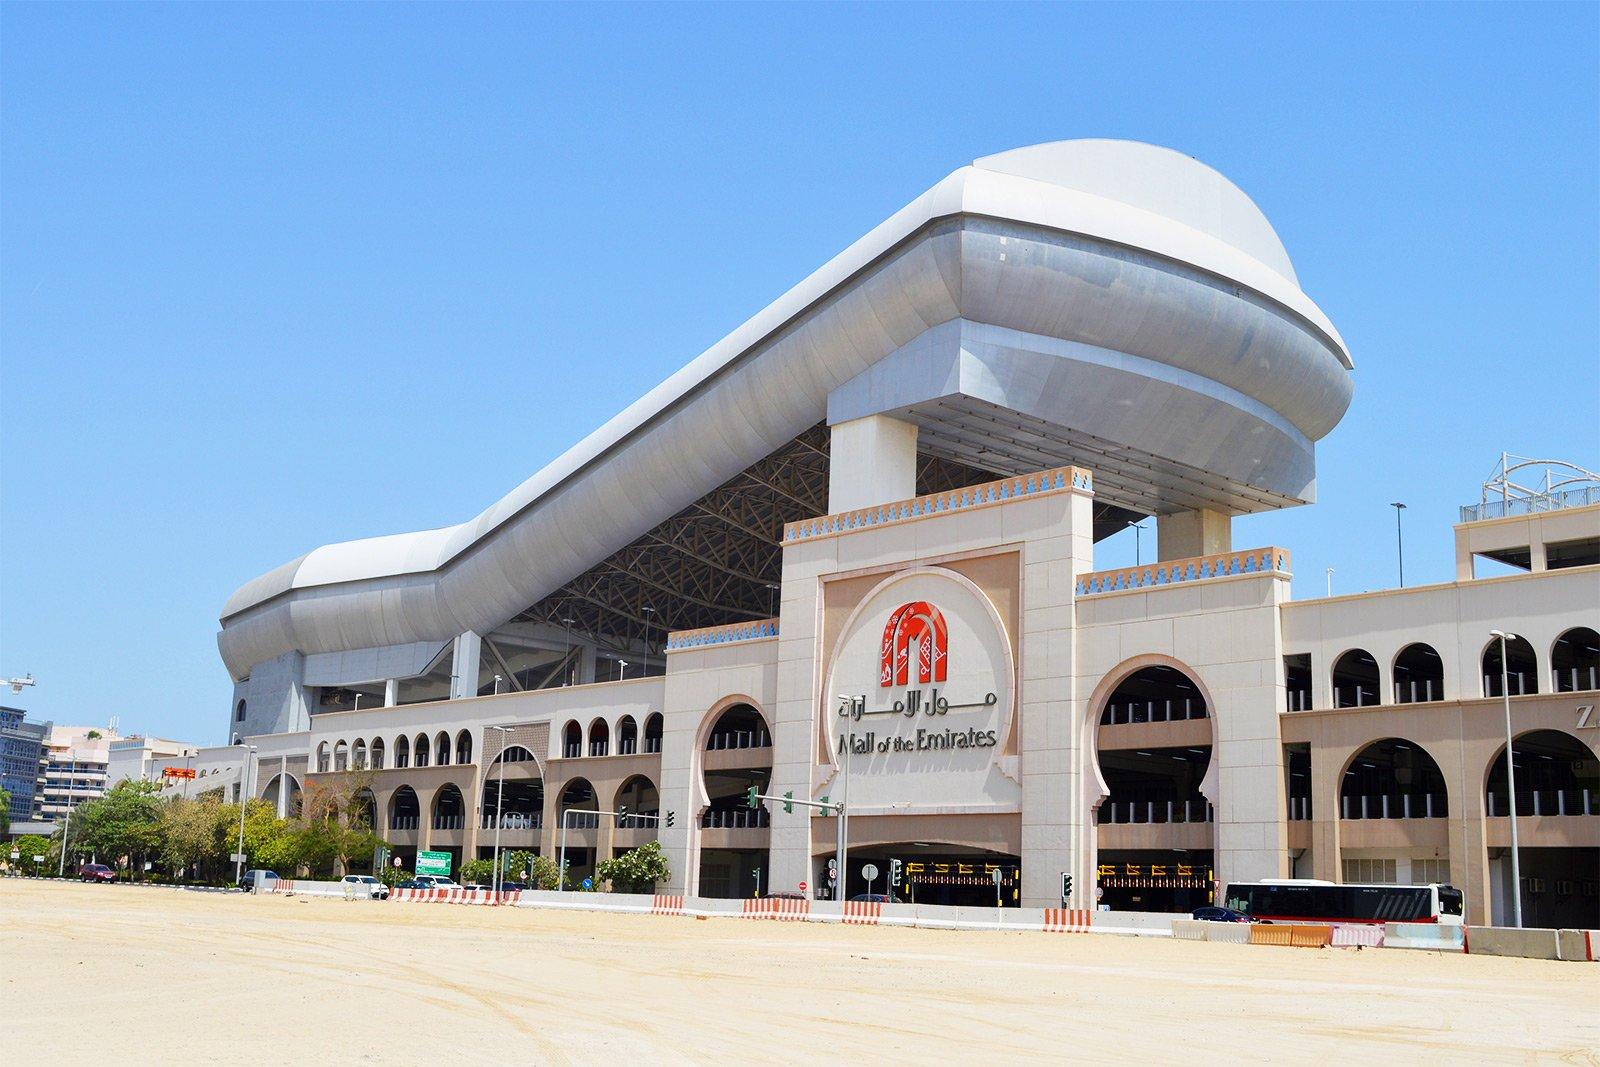 Торговый центр Молл оф Эмирейтс, Дубай 3484925b558